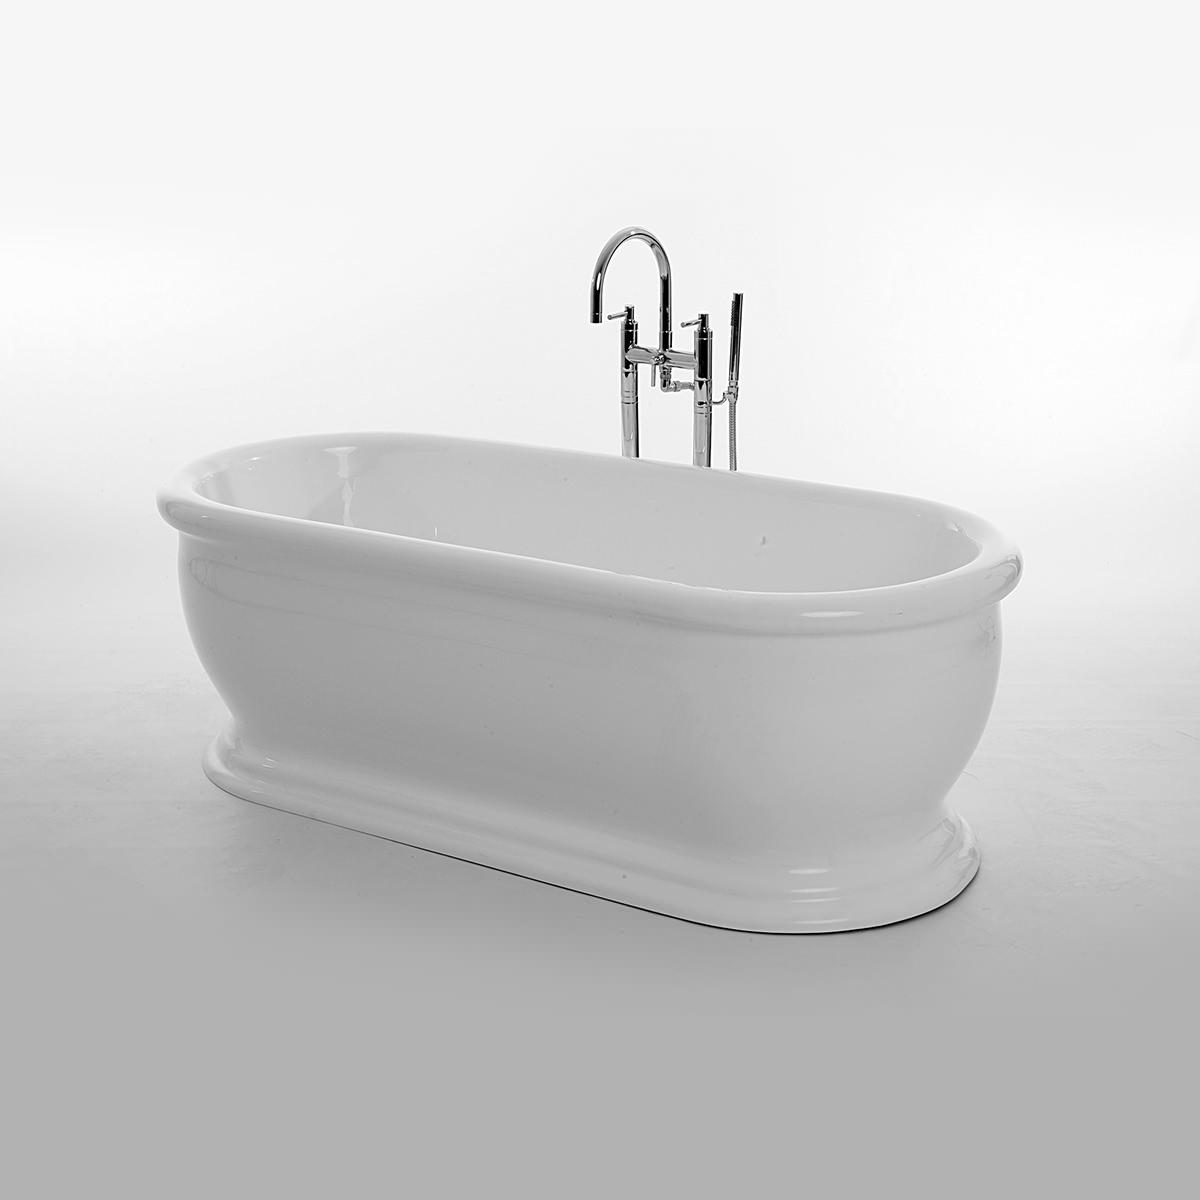 Royce Morgan Aldo Freestanding Double Ended Bath 1745 X 790mm